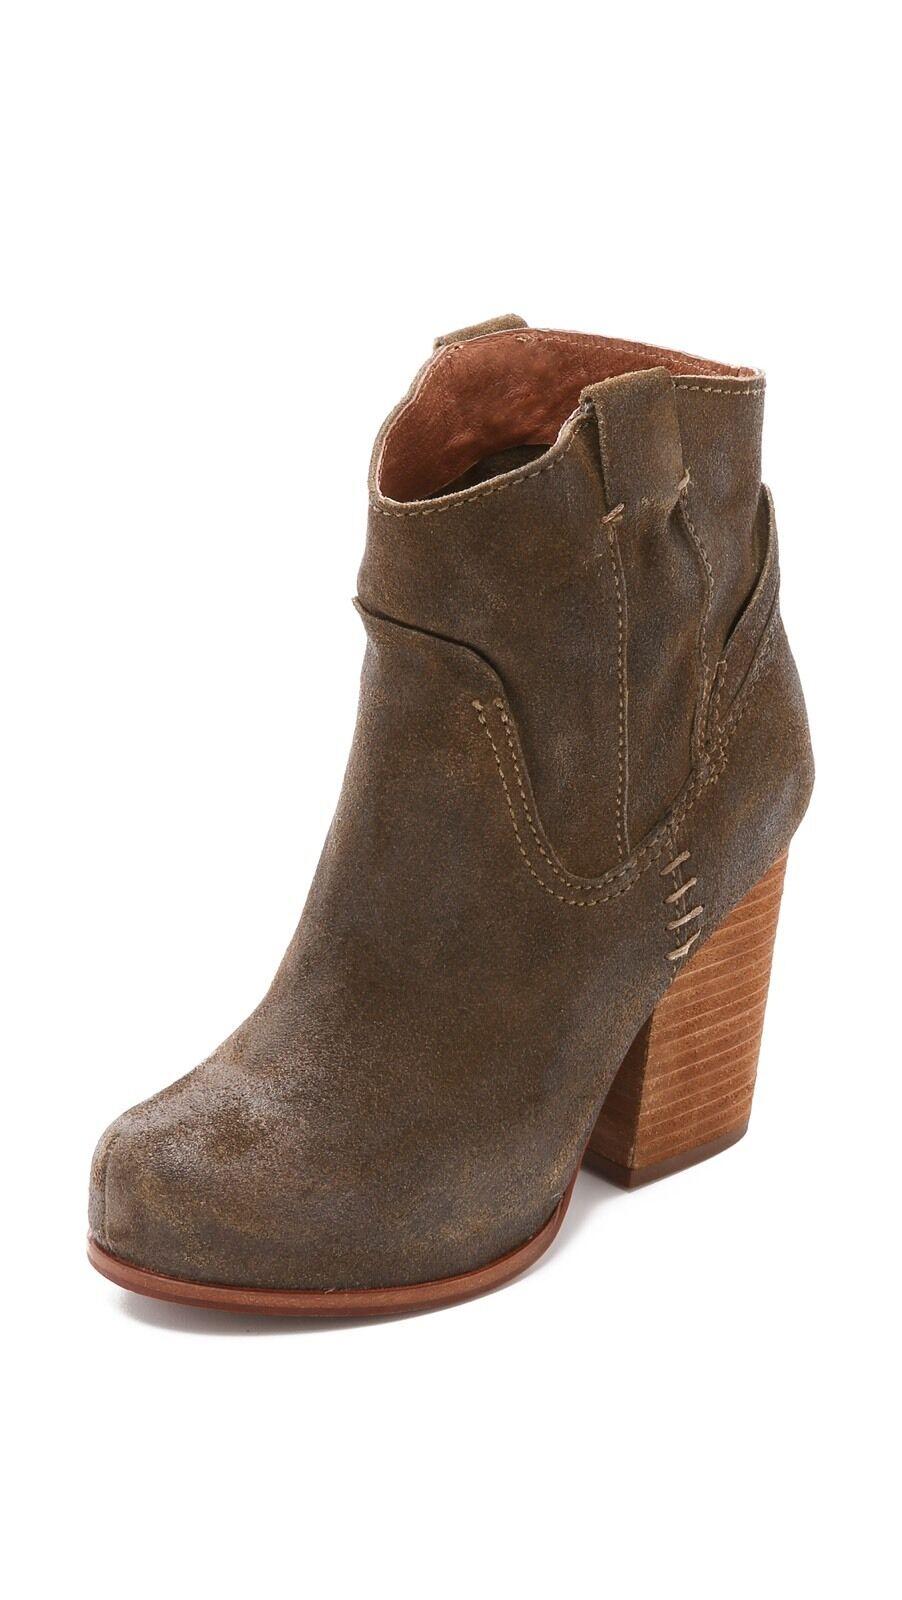 Jeffrey Campbell Showdown Suede Booties Size 7.5 MSRP   165 New Women